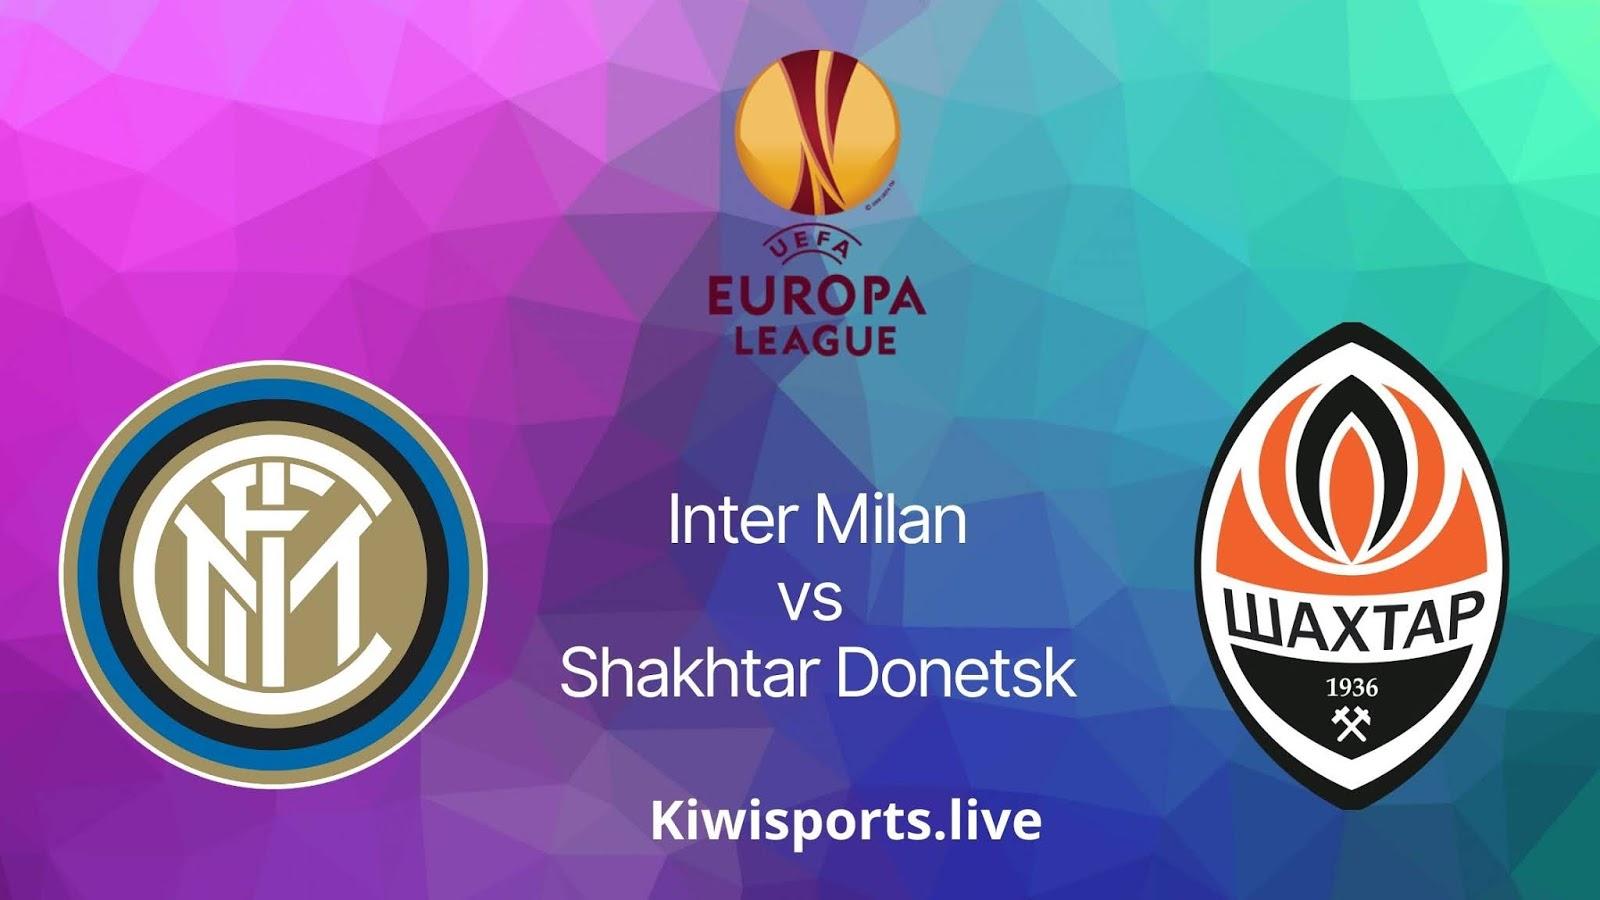 Inter Milan vs Shakhtar kiwisports epicsports IPL 2020 dubai watch free on hotstar